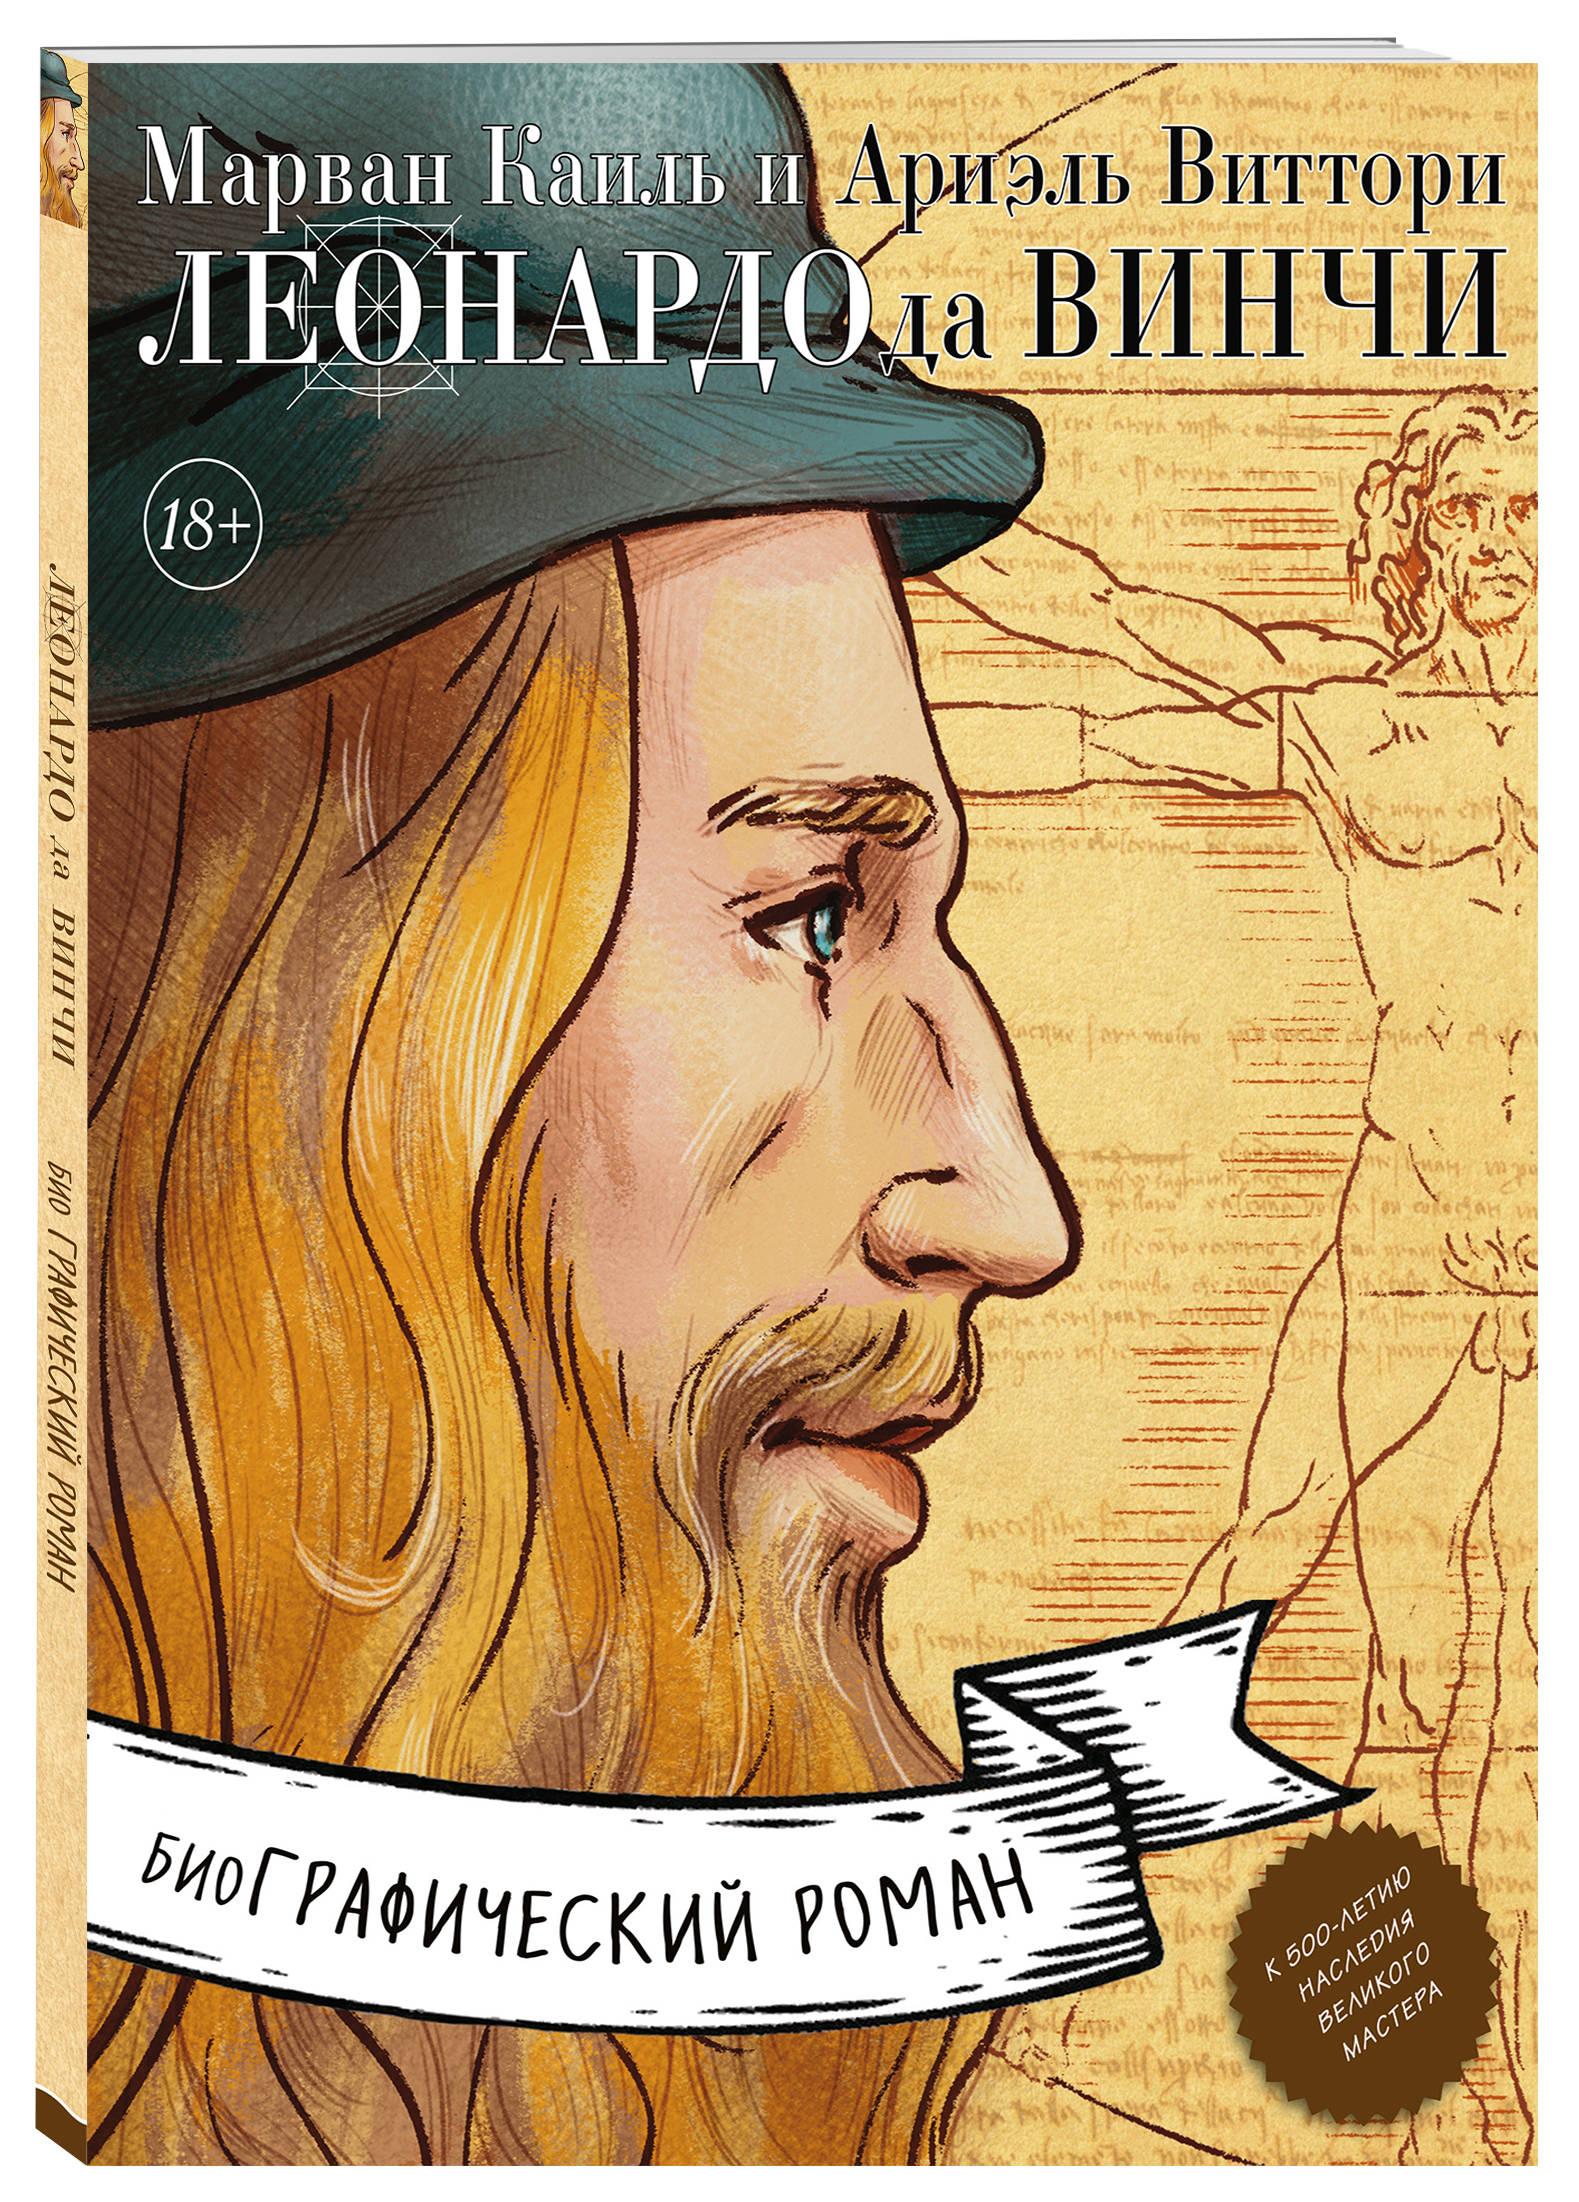 Леонардо да Винчи. Биография в комиксах ( Каиль Марван, Ариэль Виттори  )